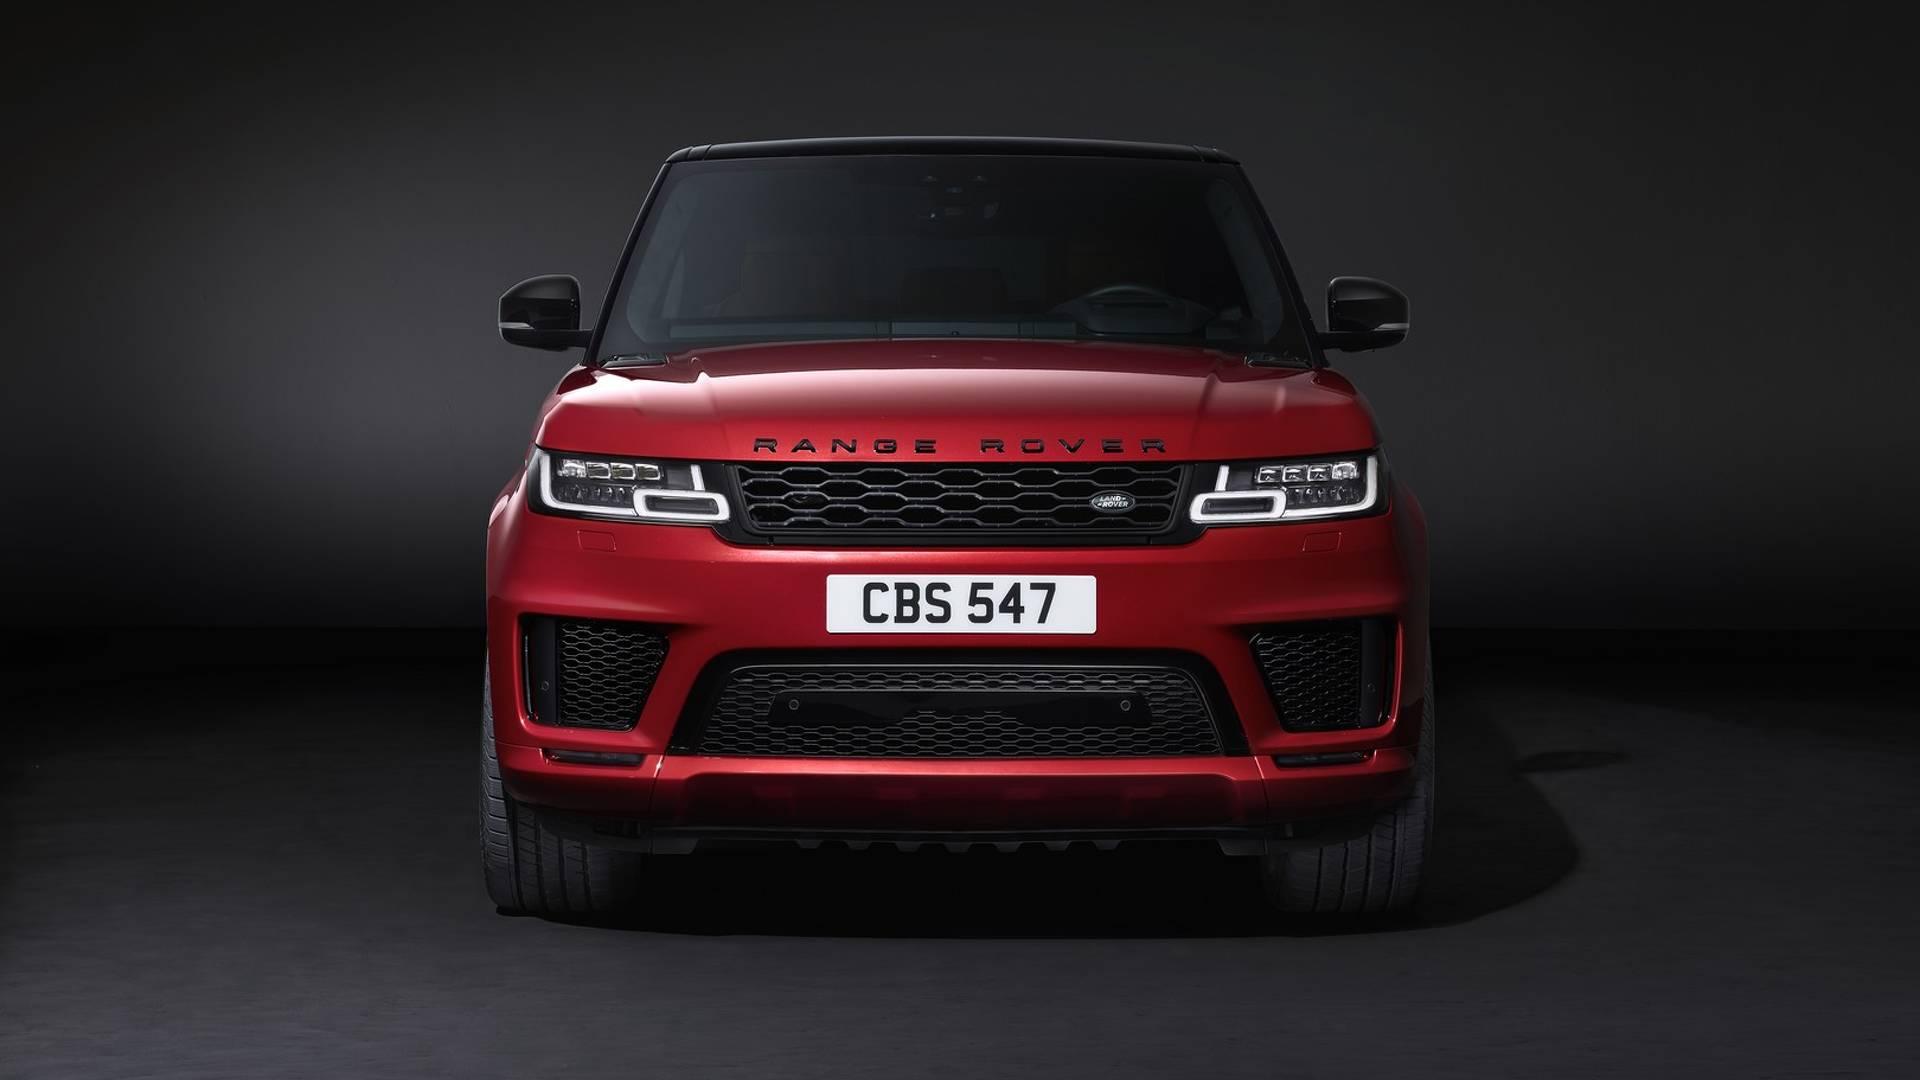 Range Rover Sport 2018 — фотогалерея